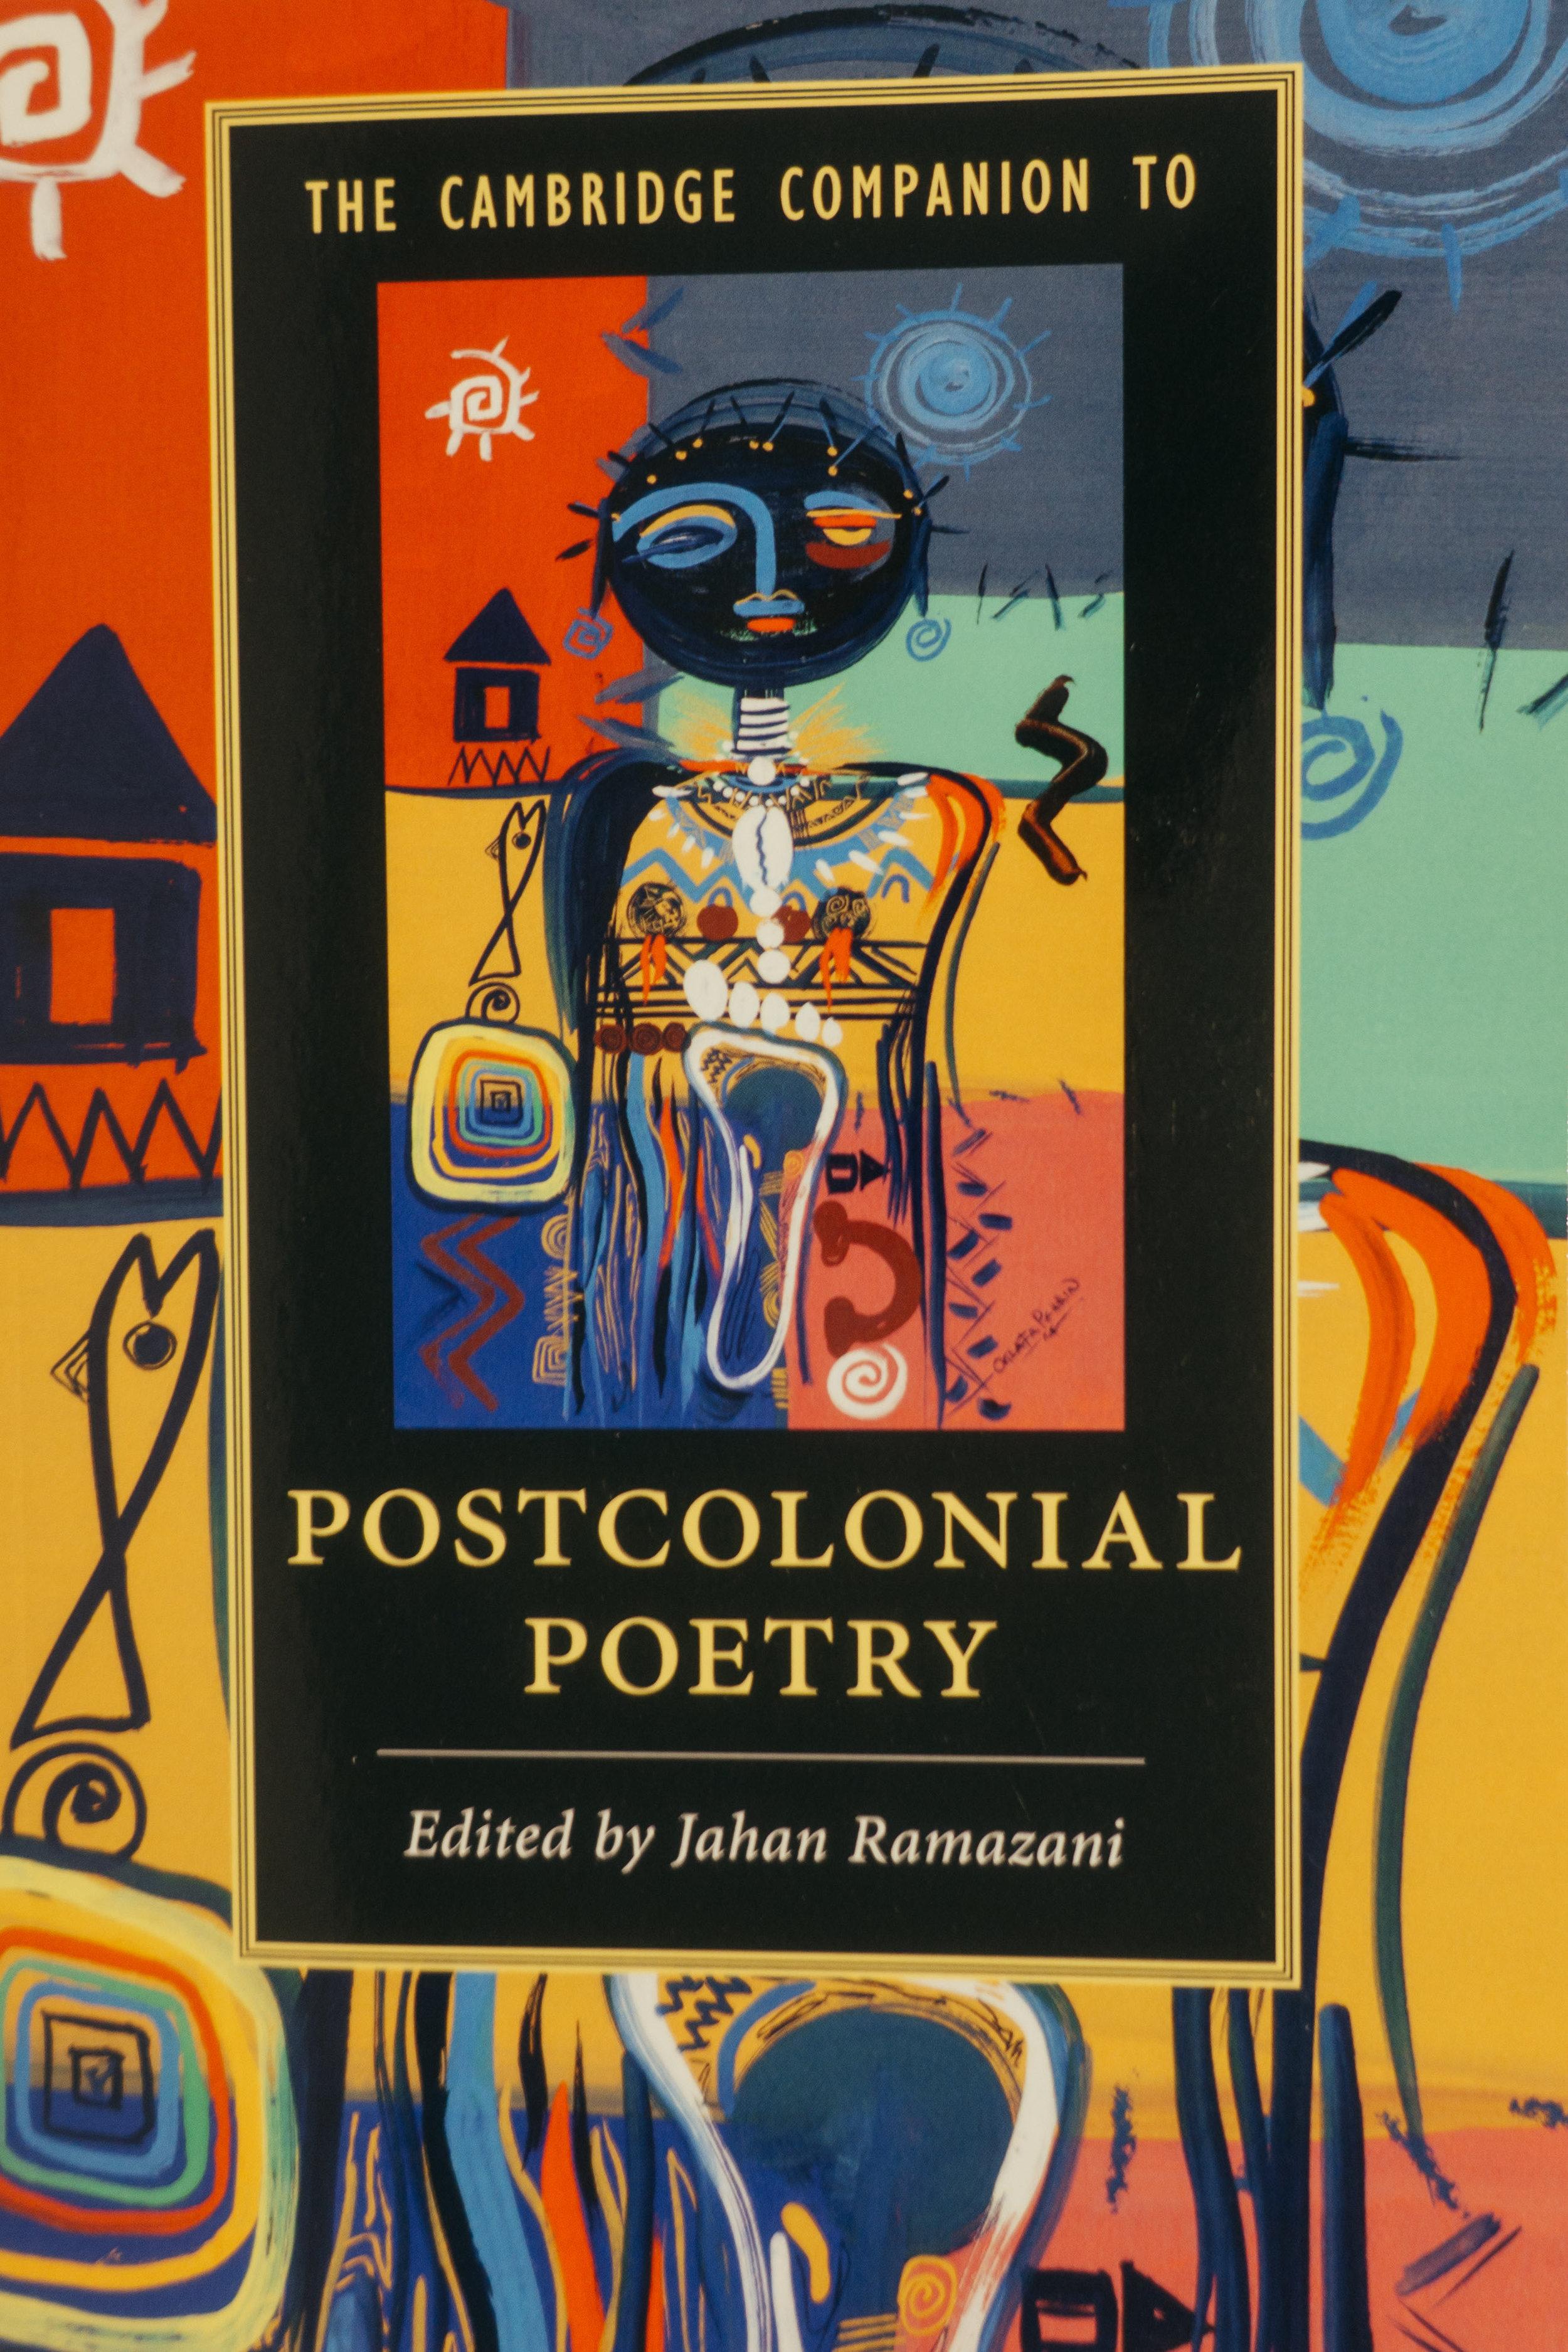 'Australia and New Zealand/Aotearoa', The Cambridge Companion to Postcolonial Poetry ,ed Jahan Ramazani, Cambridge University Press, Cambridge, 2017.